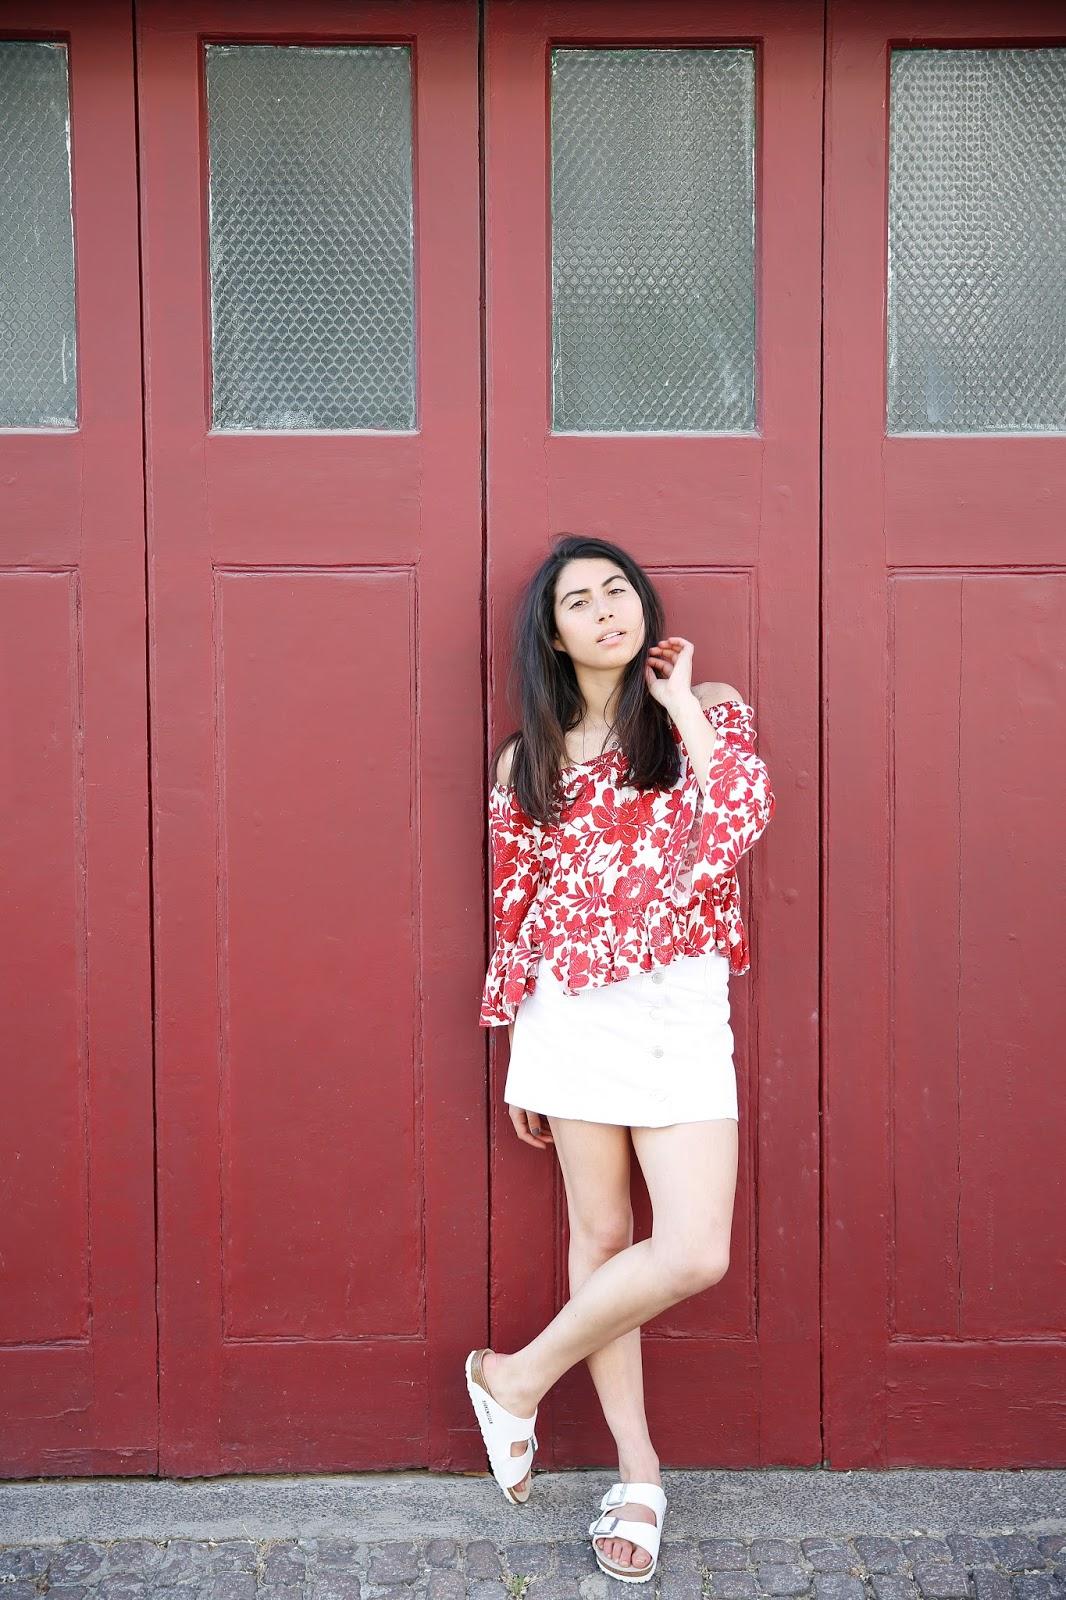 London Fashion Photographer & Blogger, Victoria Metaxas